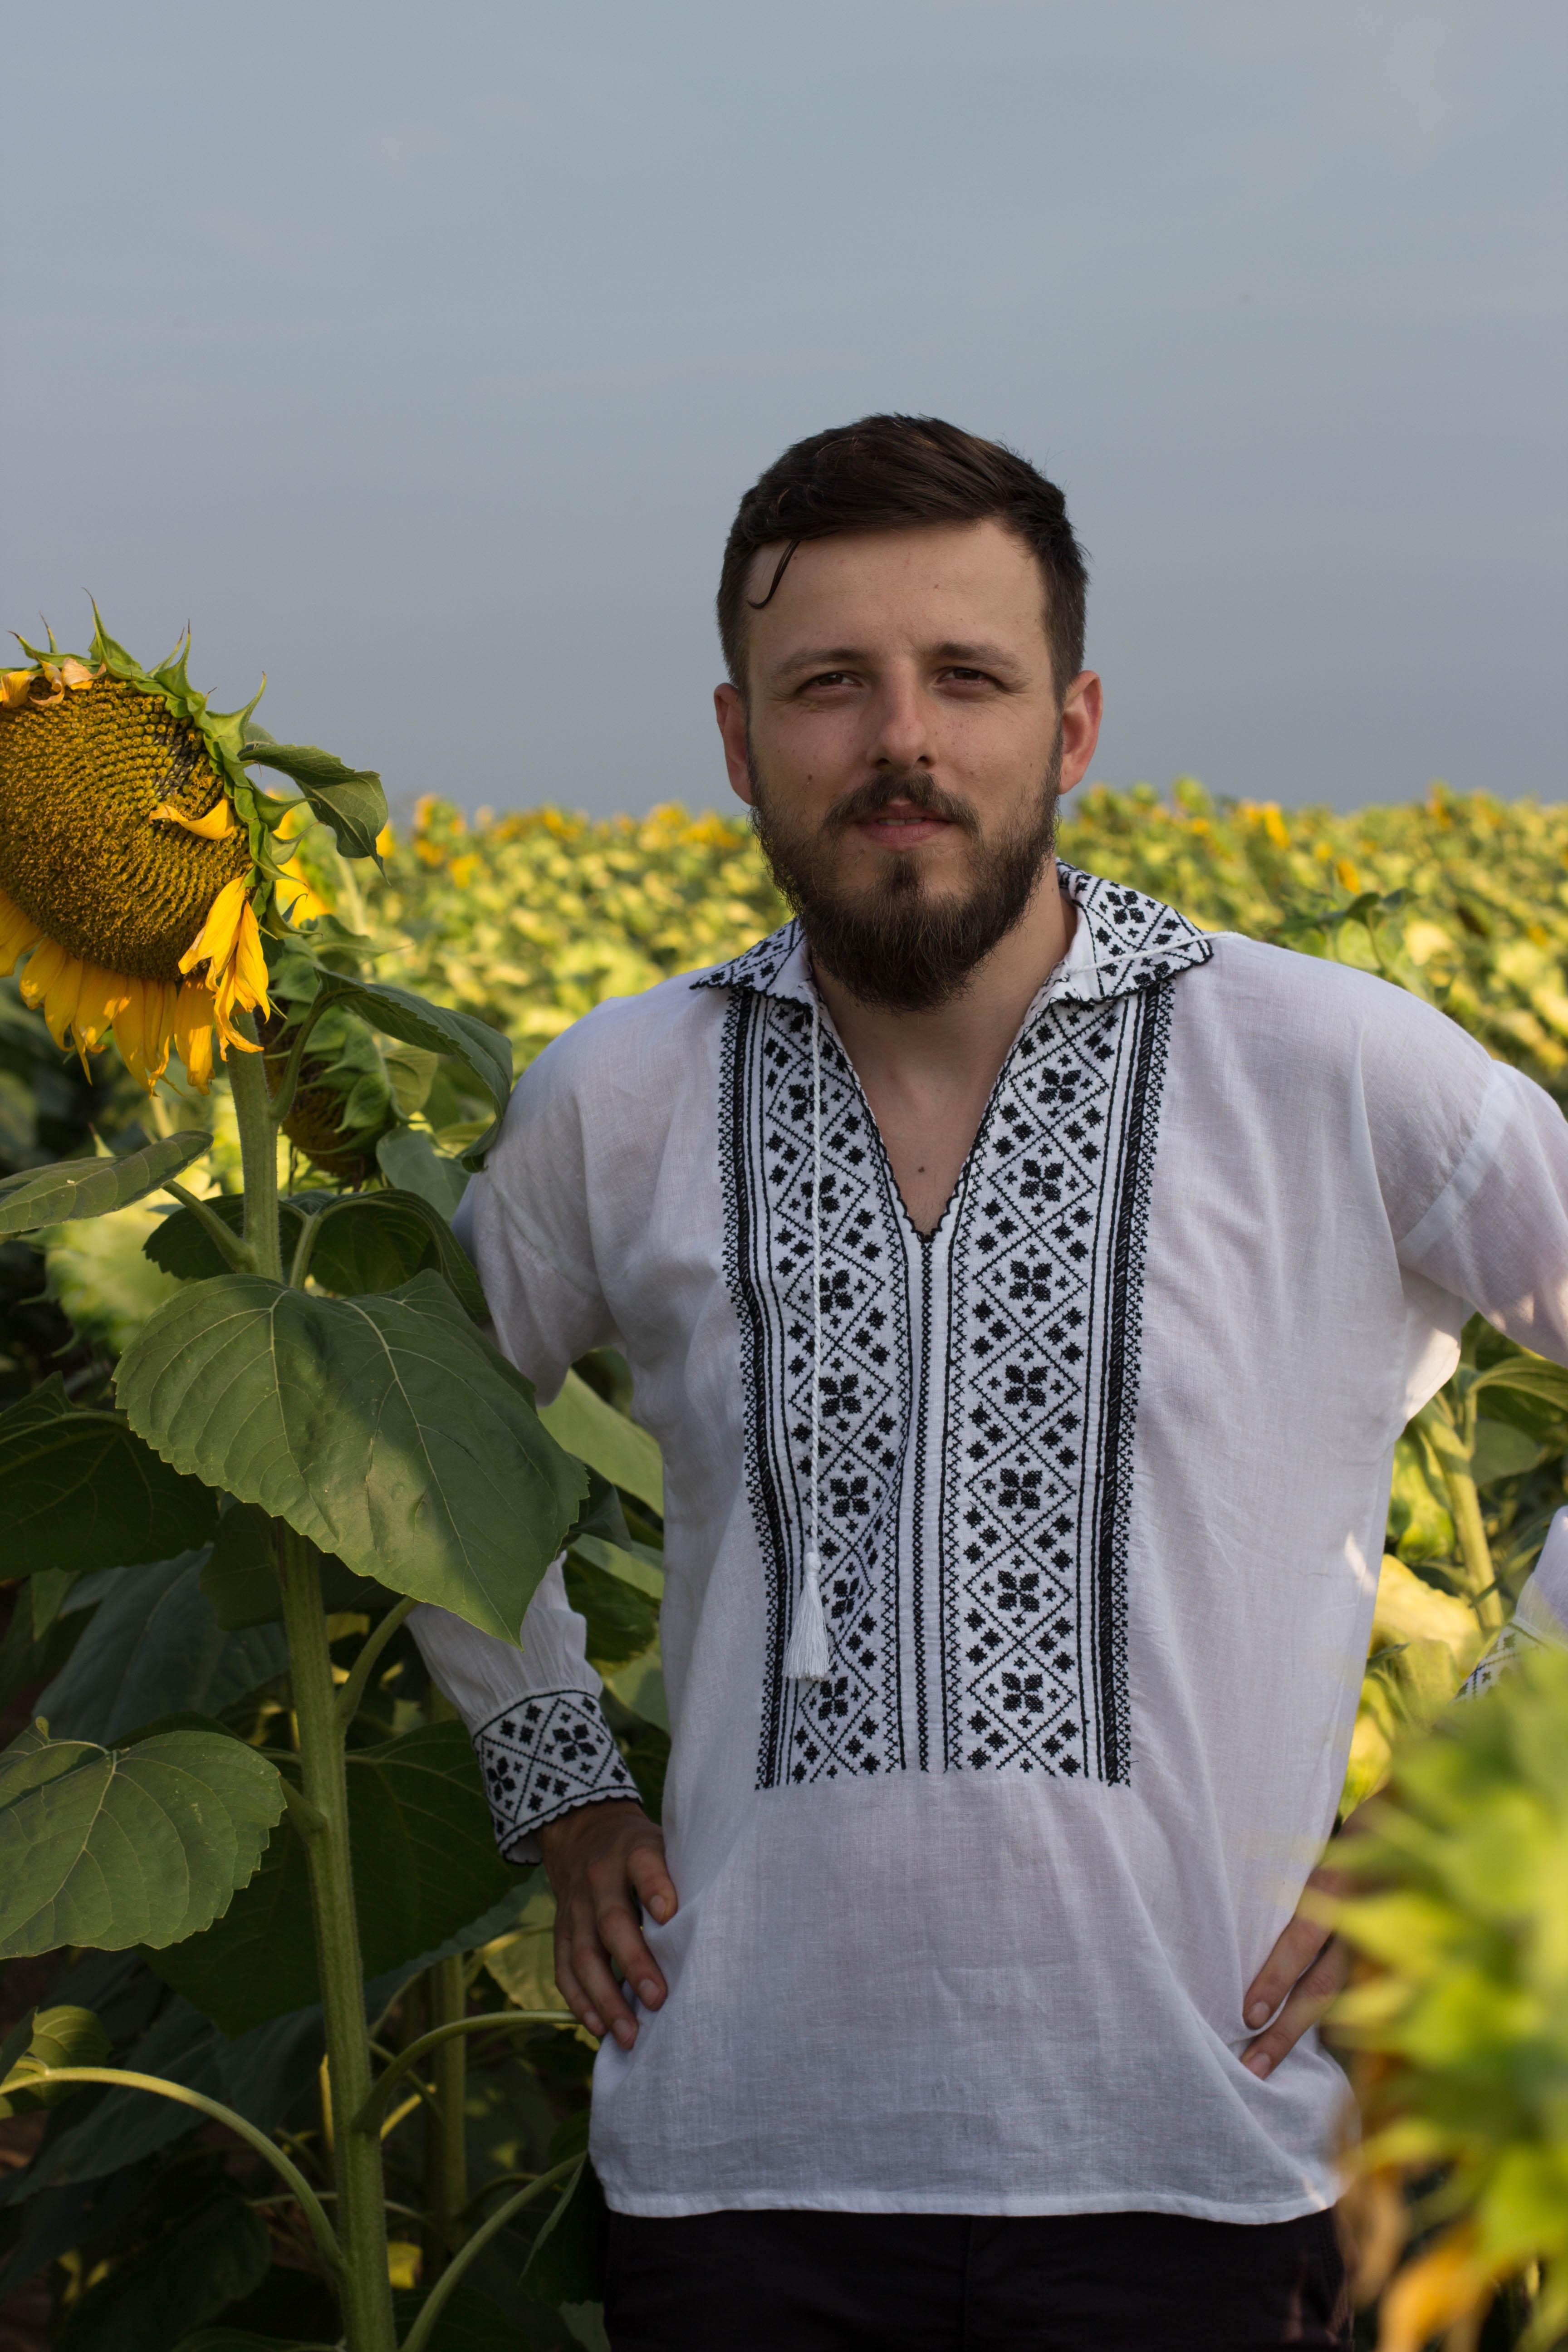 noua versiune vânzare cu ridicata soiuri largi Ii traditionale romanesti si bluze - IiRomanesti.com